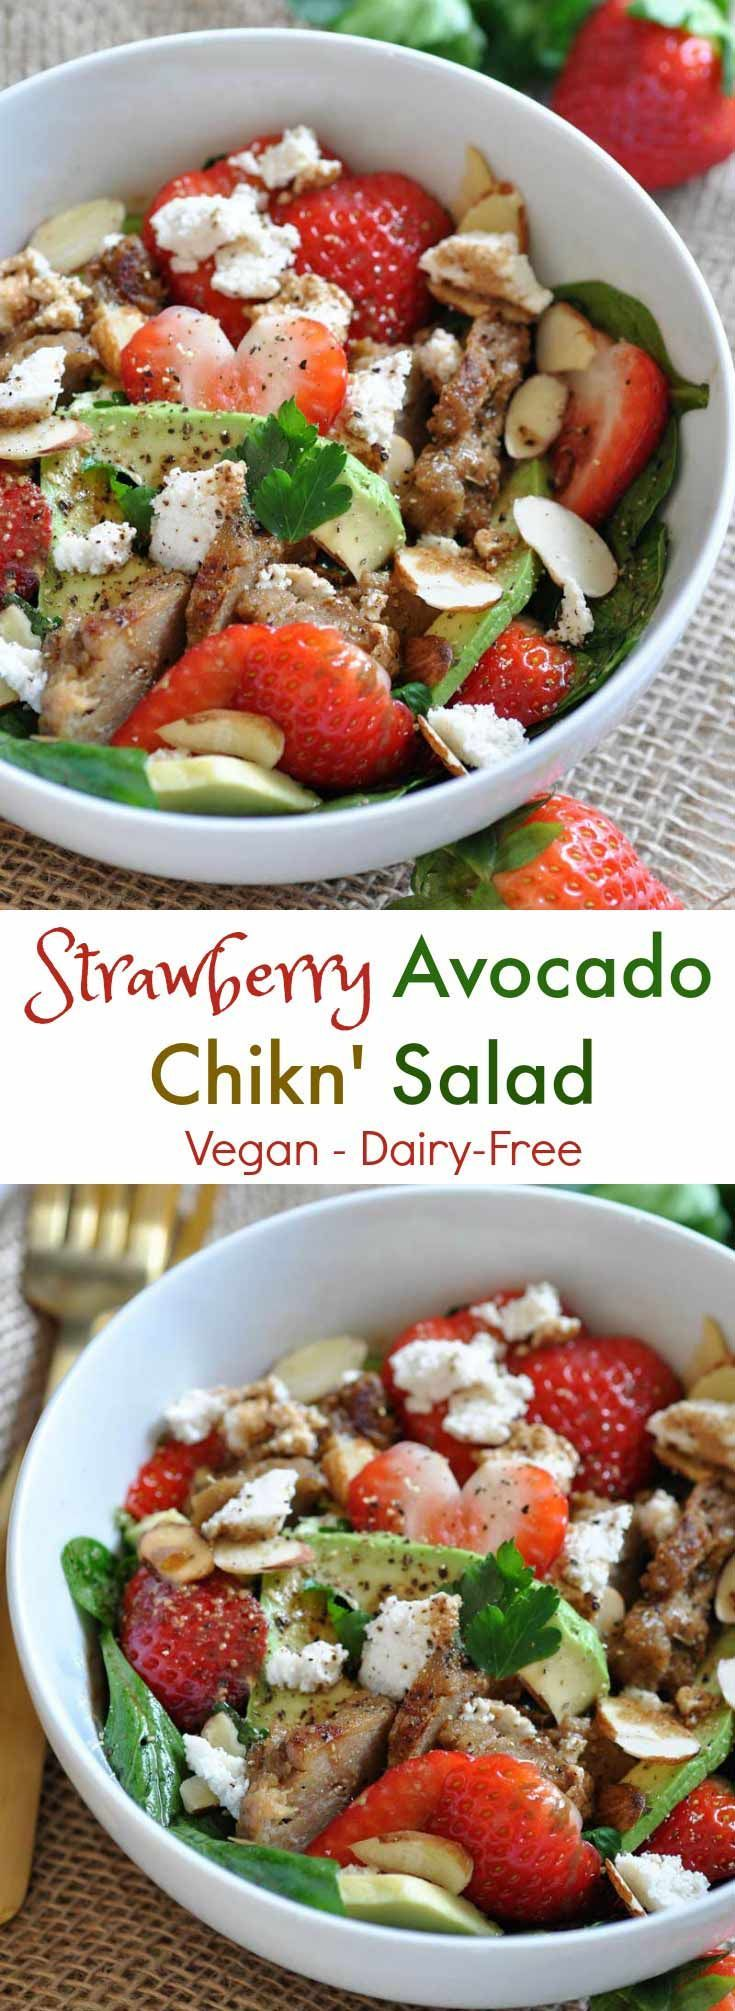 Strawberry Avocado Chikn' Salad